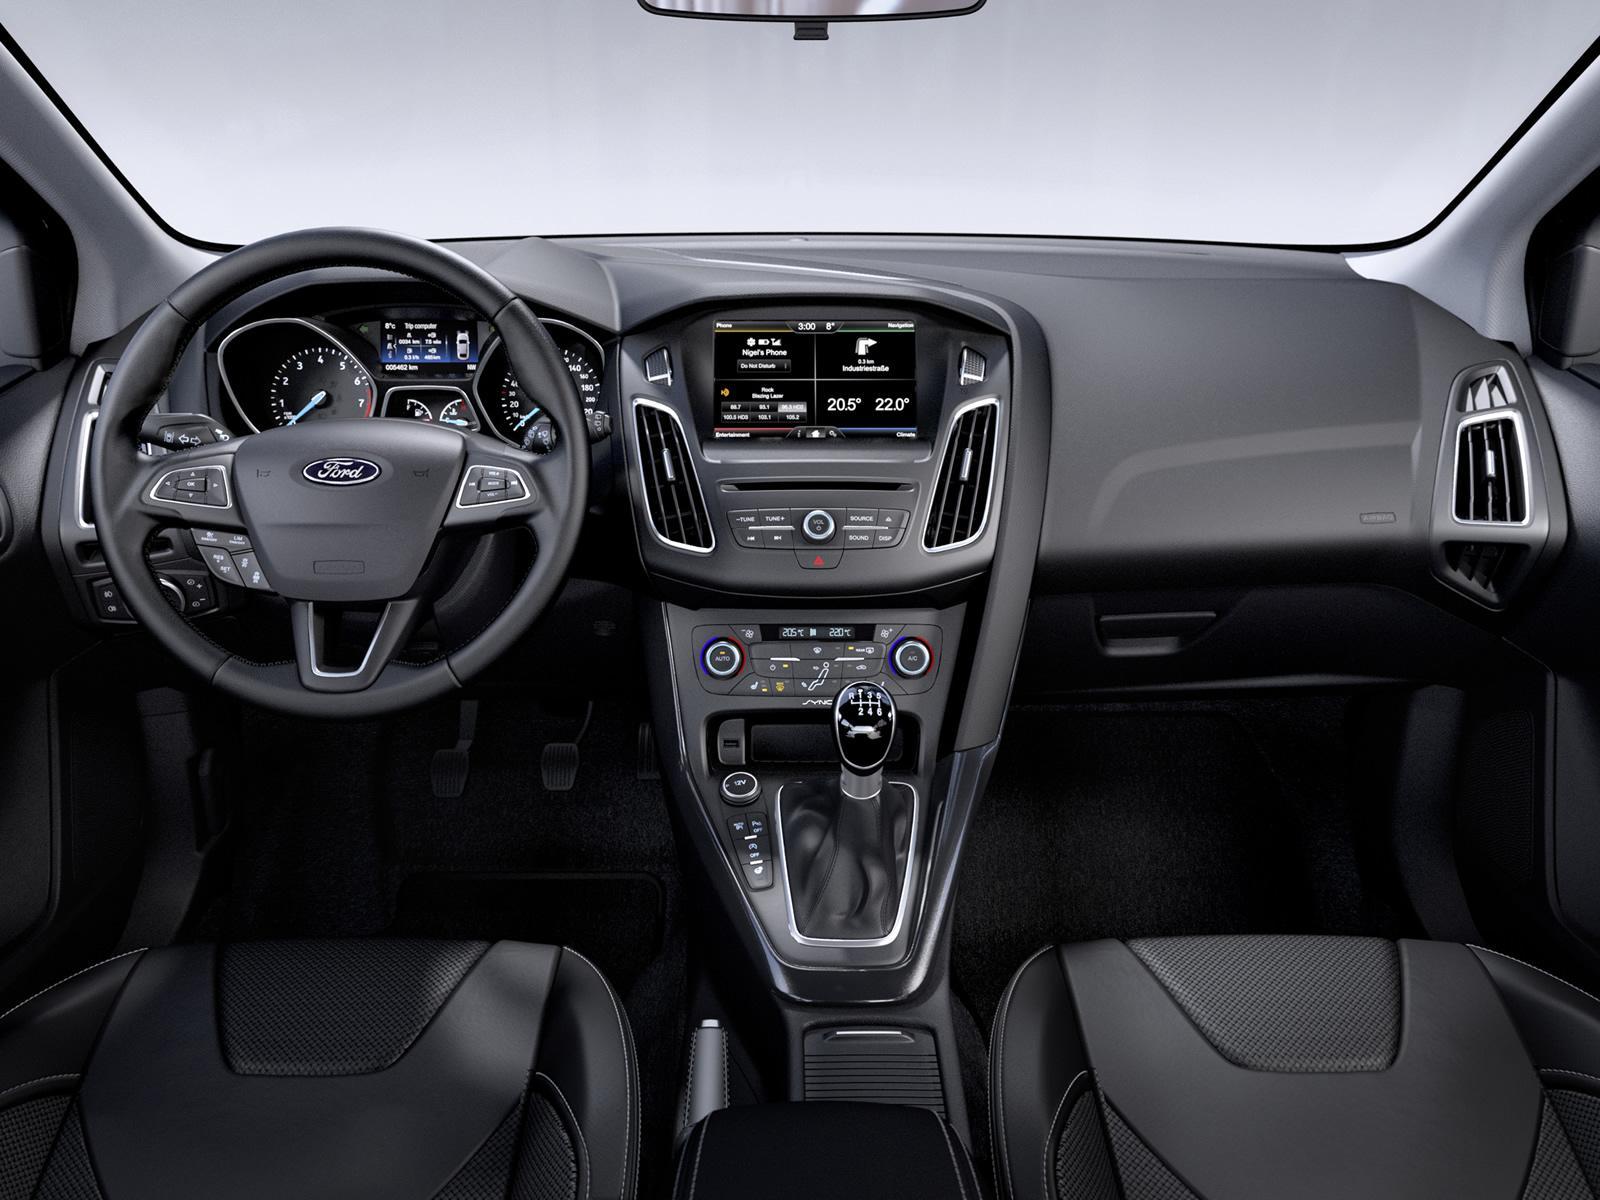 2014 Ford Focus Facelift Interior Dashboard Forcegt Com